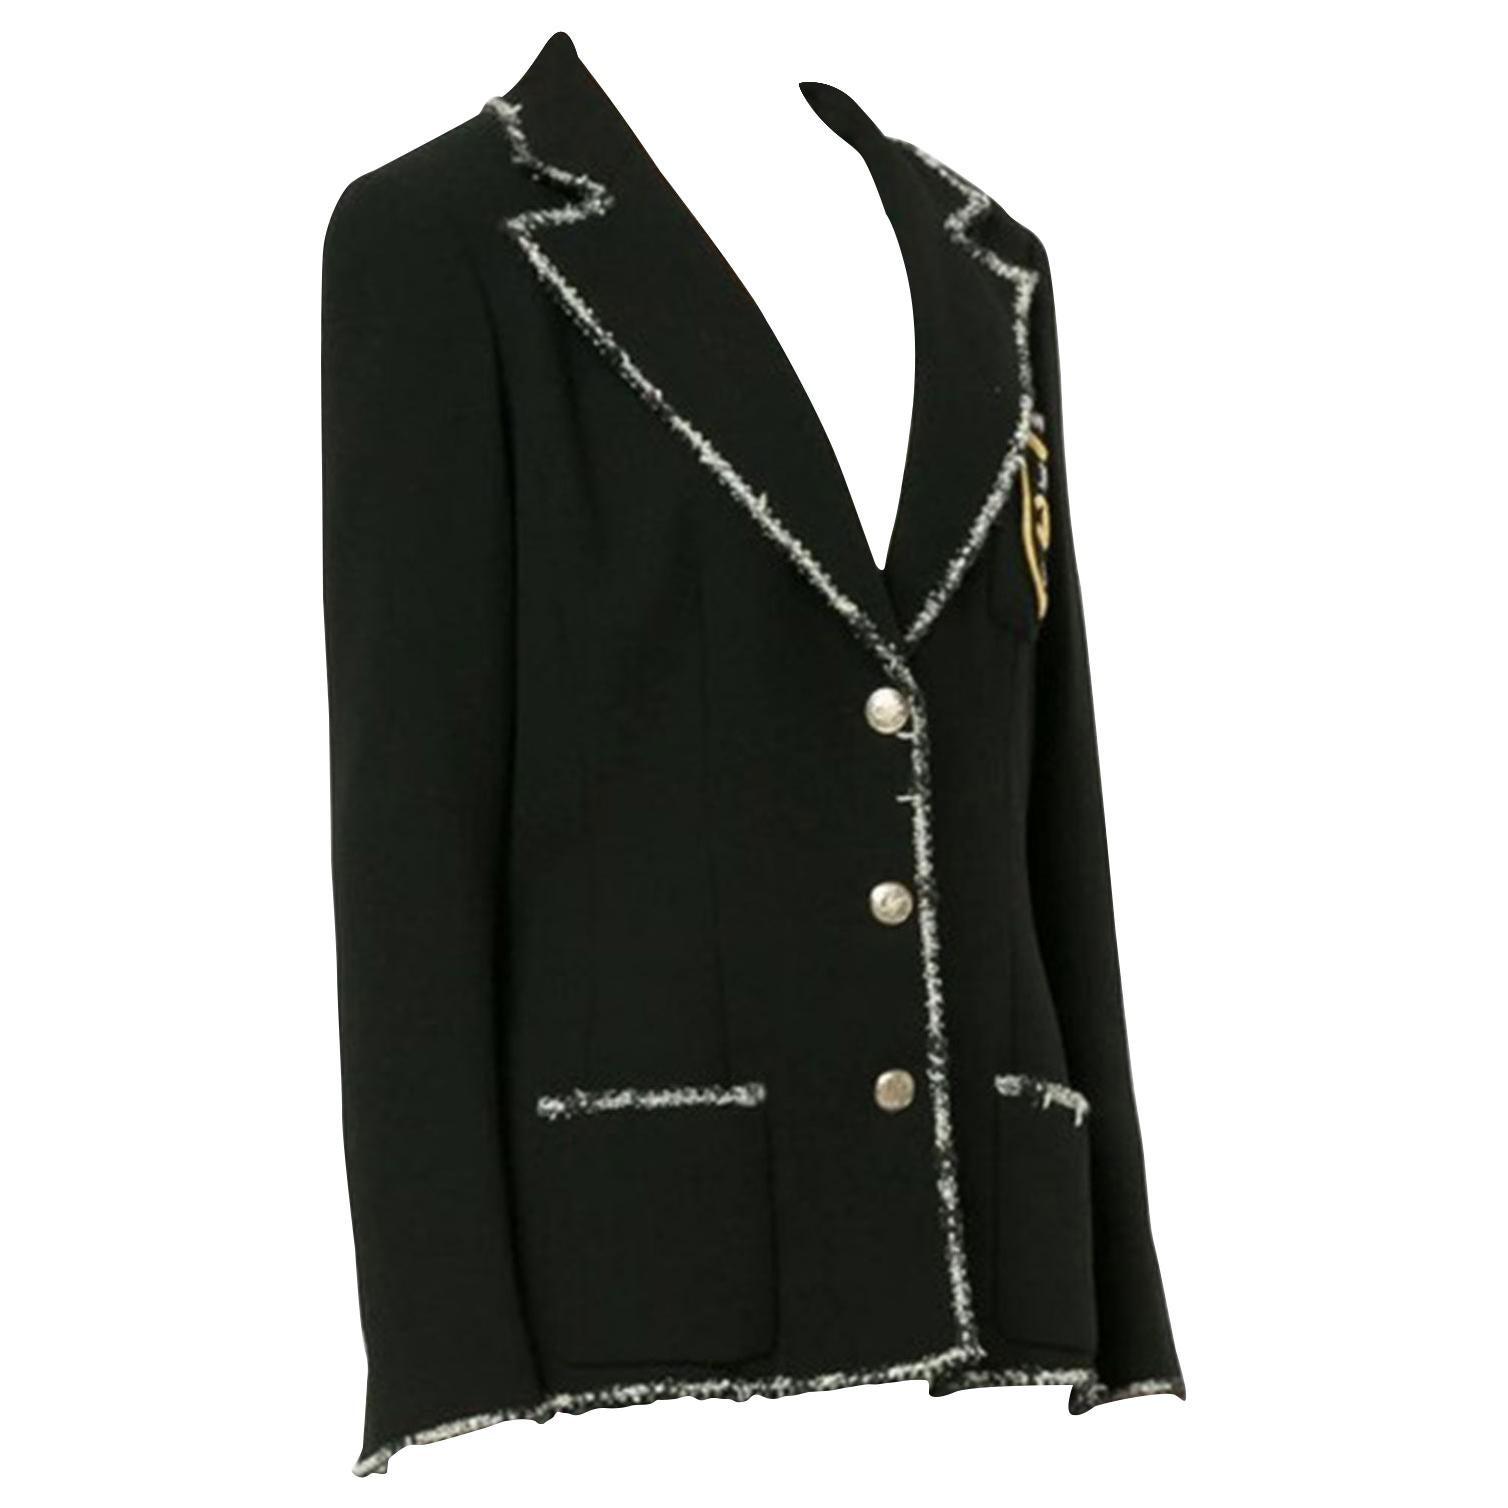 Chanel Black White W Devil Wears Prada Boucle Jacket Perfume Bottle Blazer